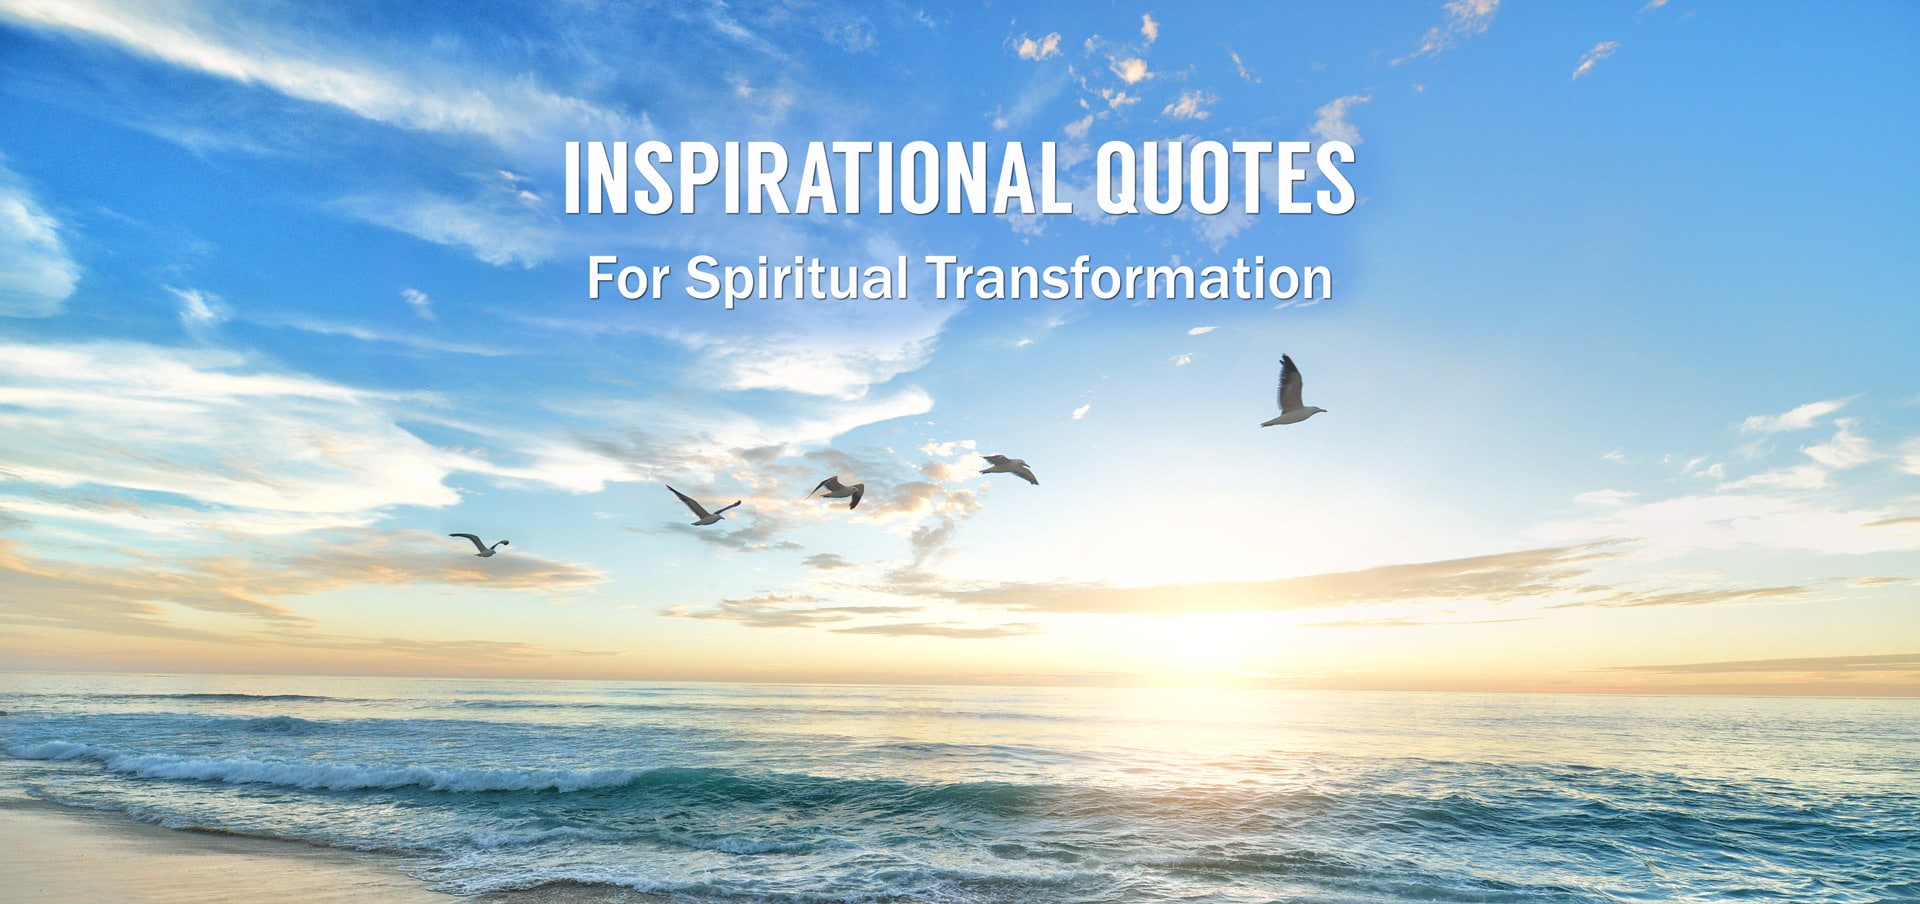 Inspirational Quotes for Spiritual Transformation